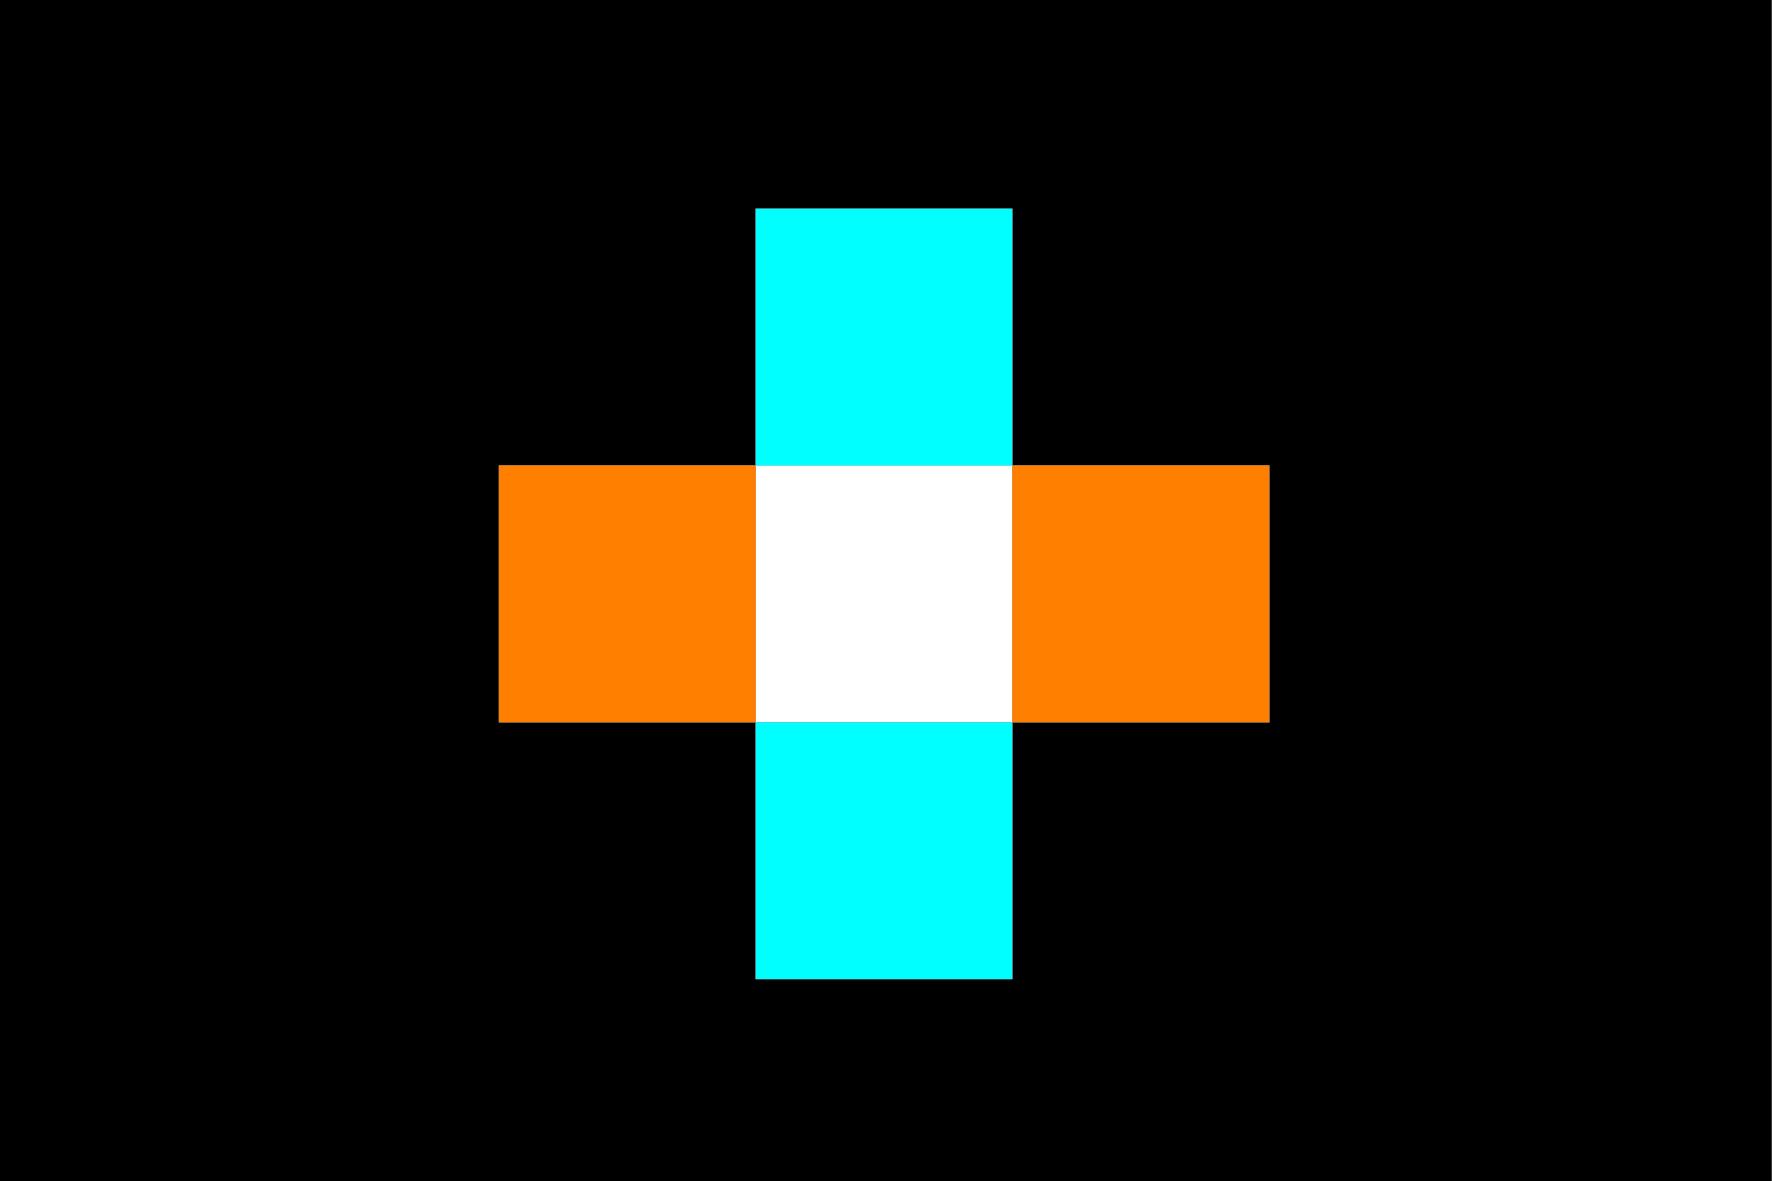 simbolo-croce-logogenesi